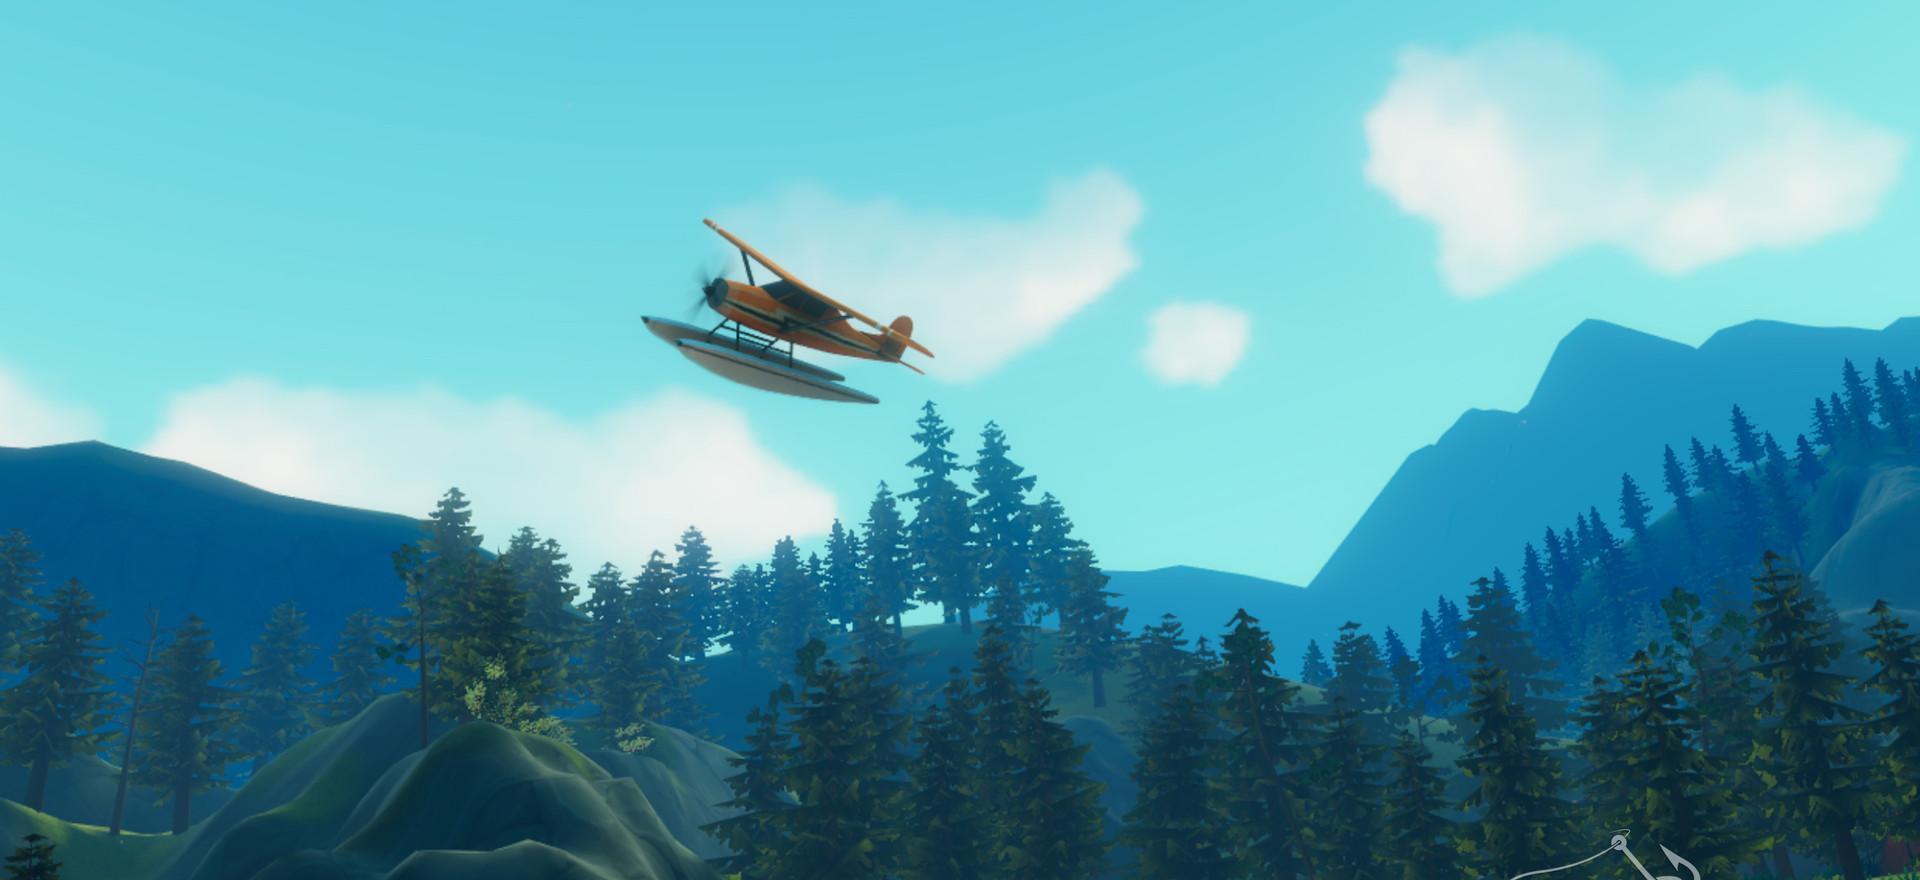 Catch & Release - its a plane.jpg